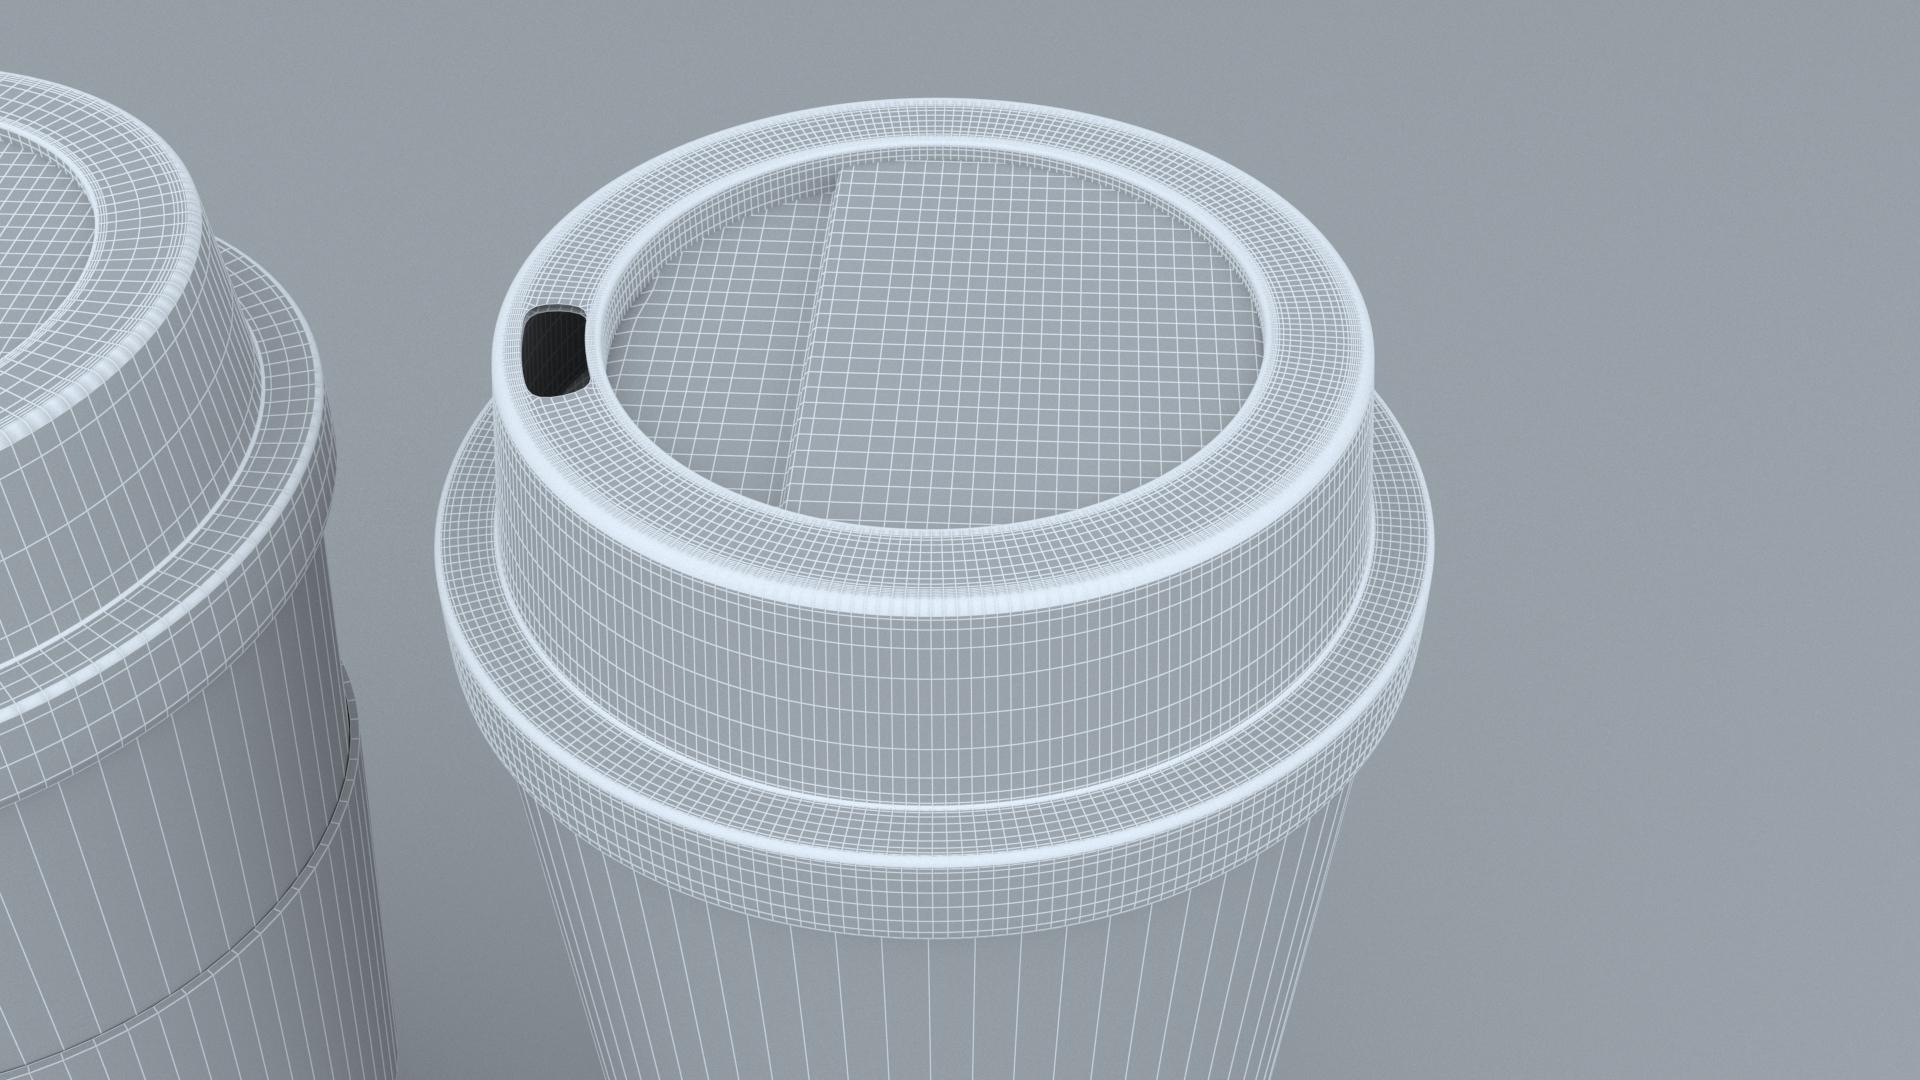 12.jpg Download STL file Coffee Cup • 3D printing template, illusioncreators1979